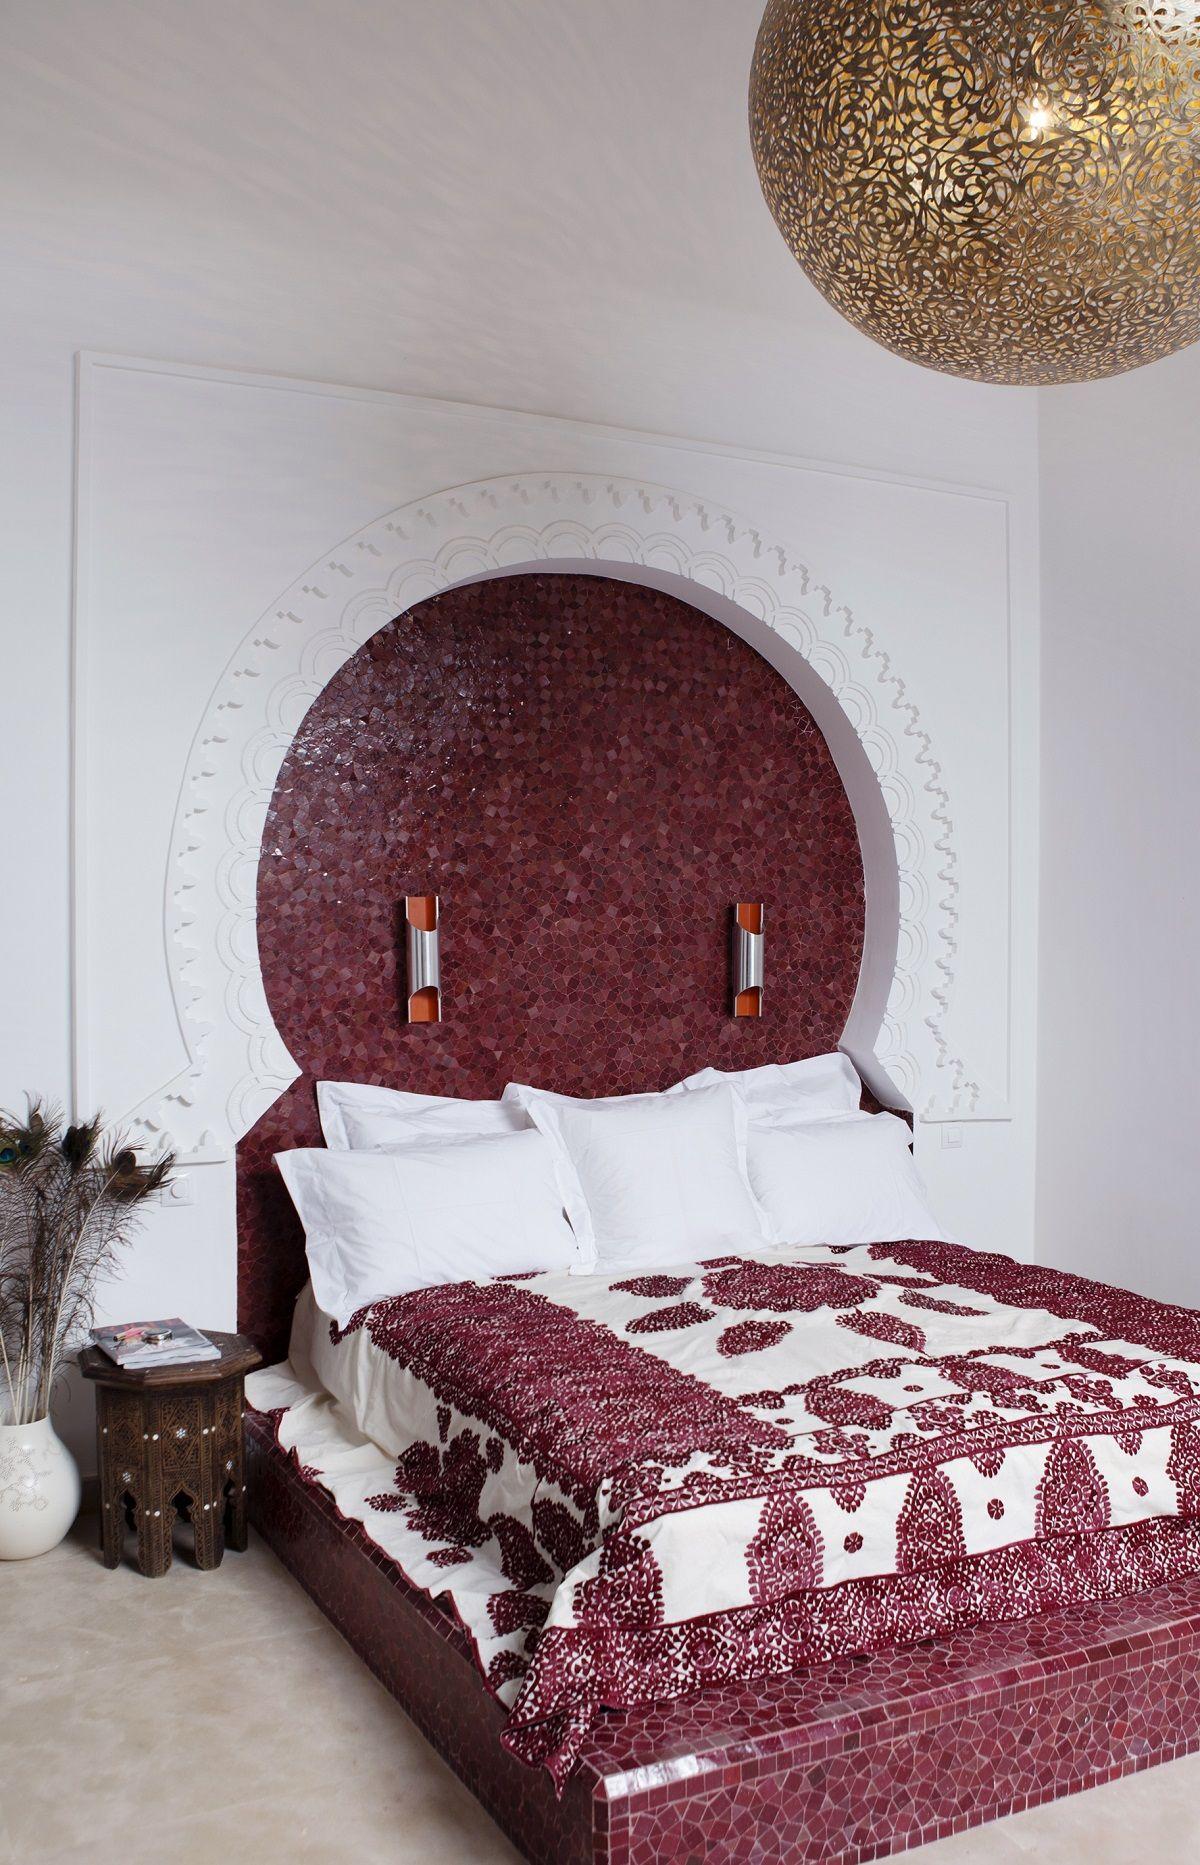 Pin on Interior Design Inspiration